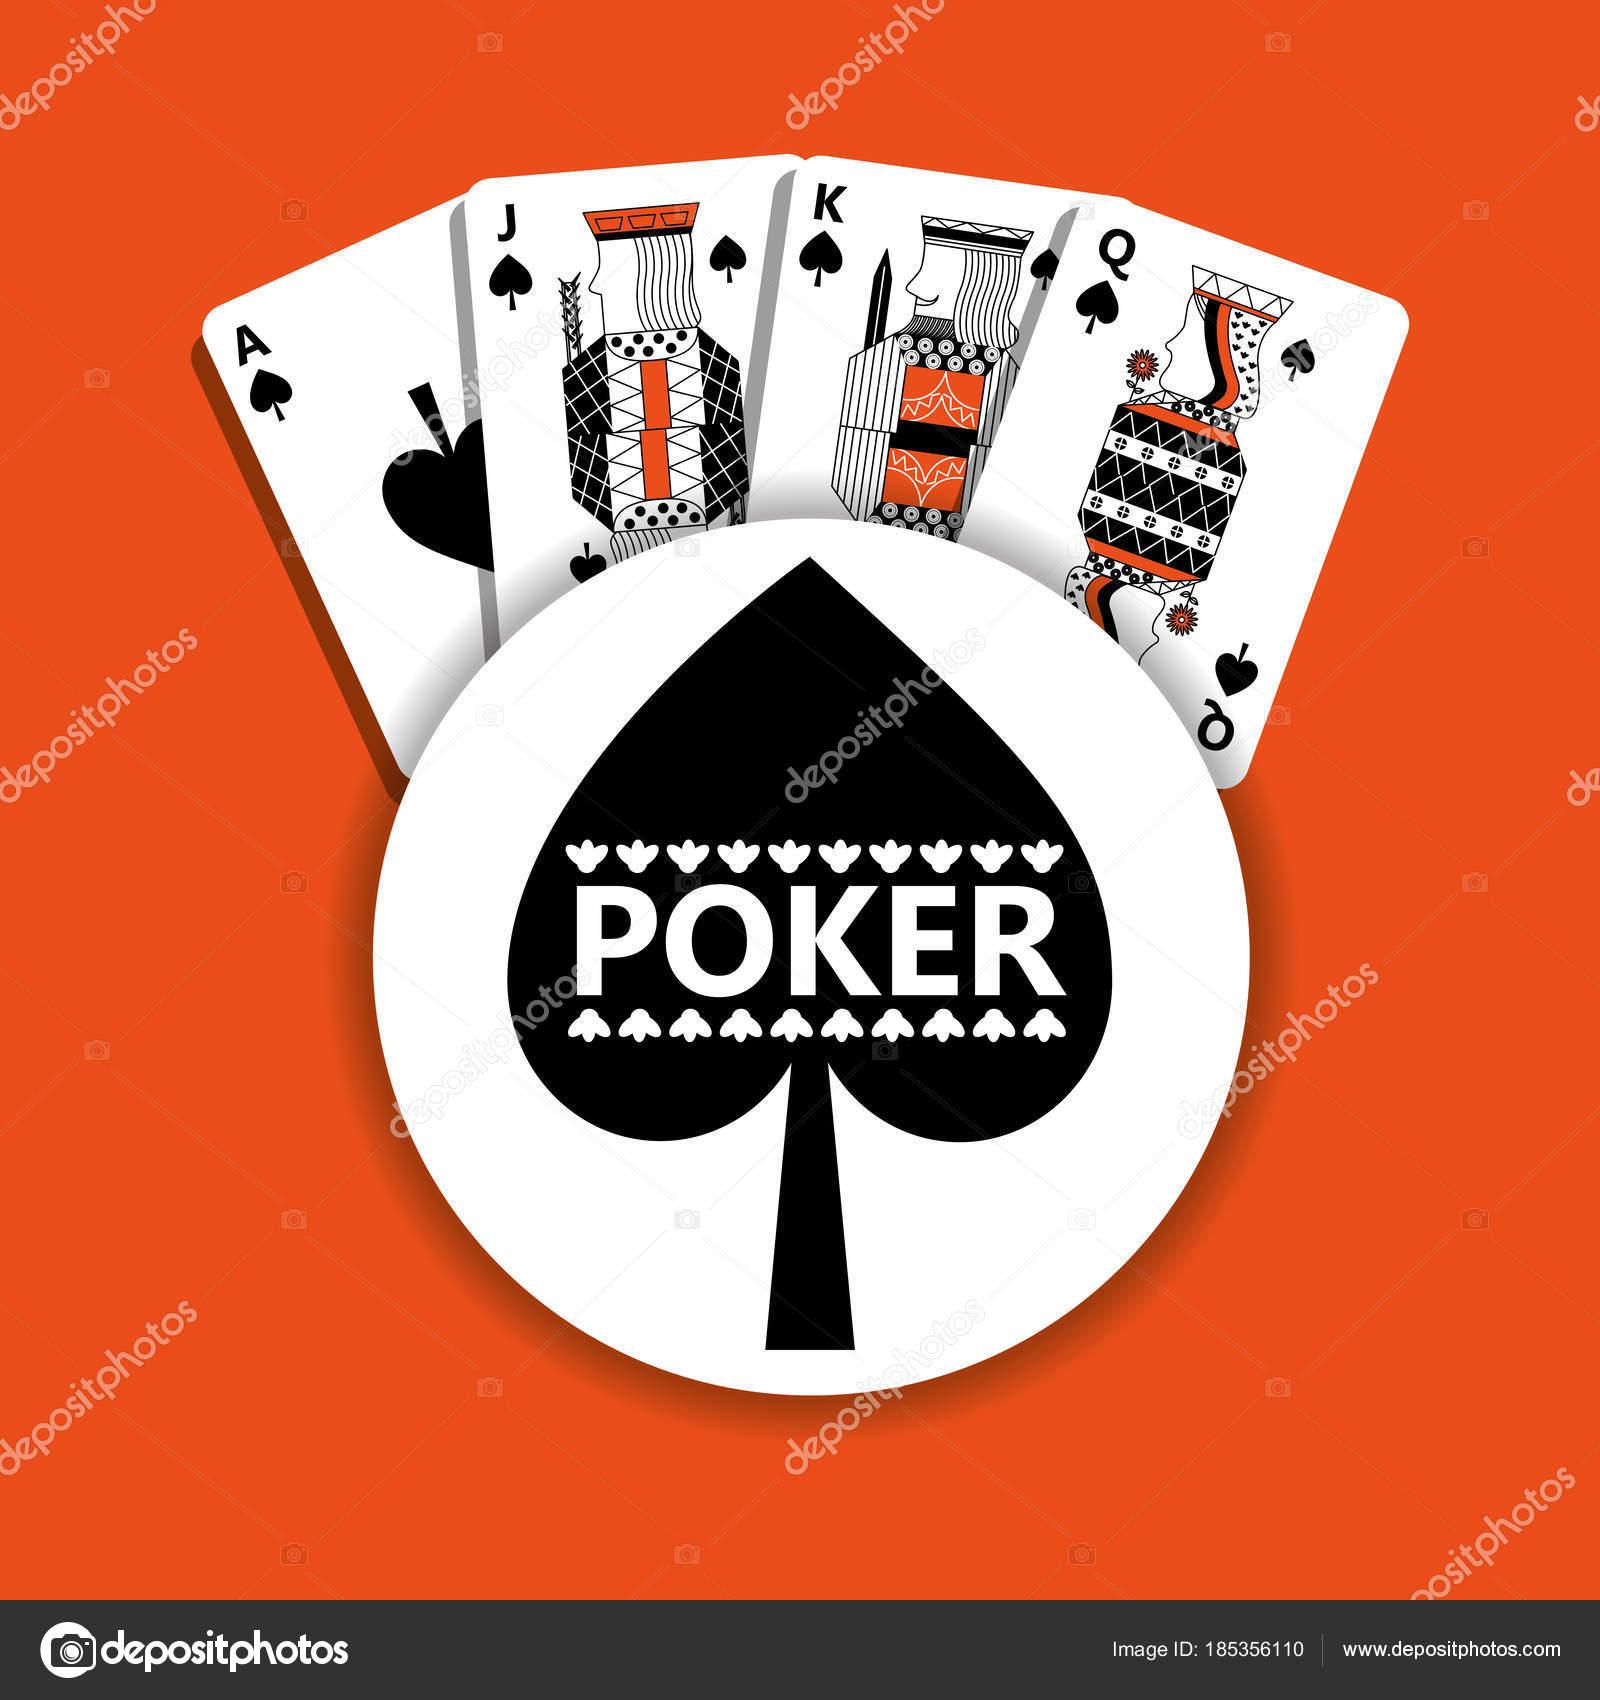 Spade Emblem Kasino Karty Bohatstvi Pokeru Stock Vektor